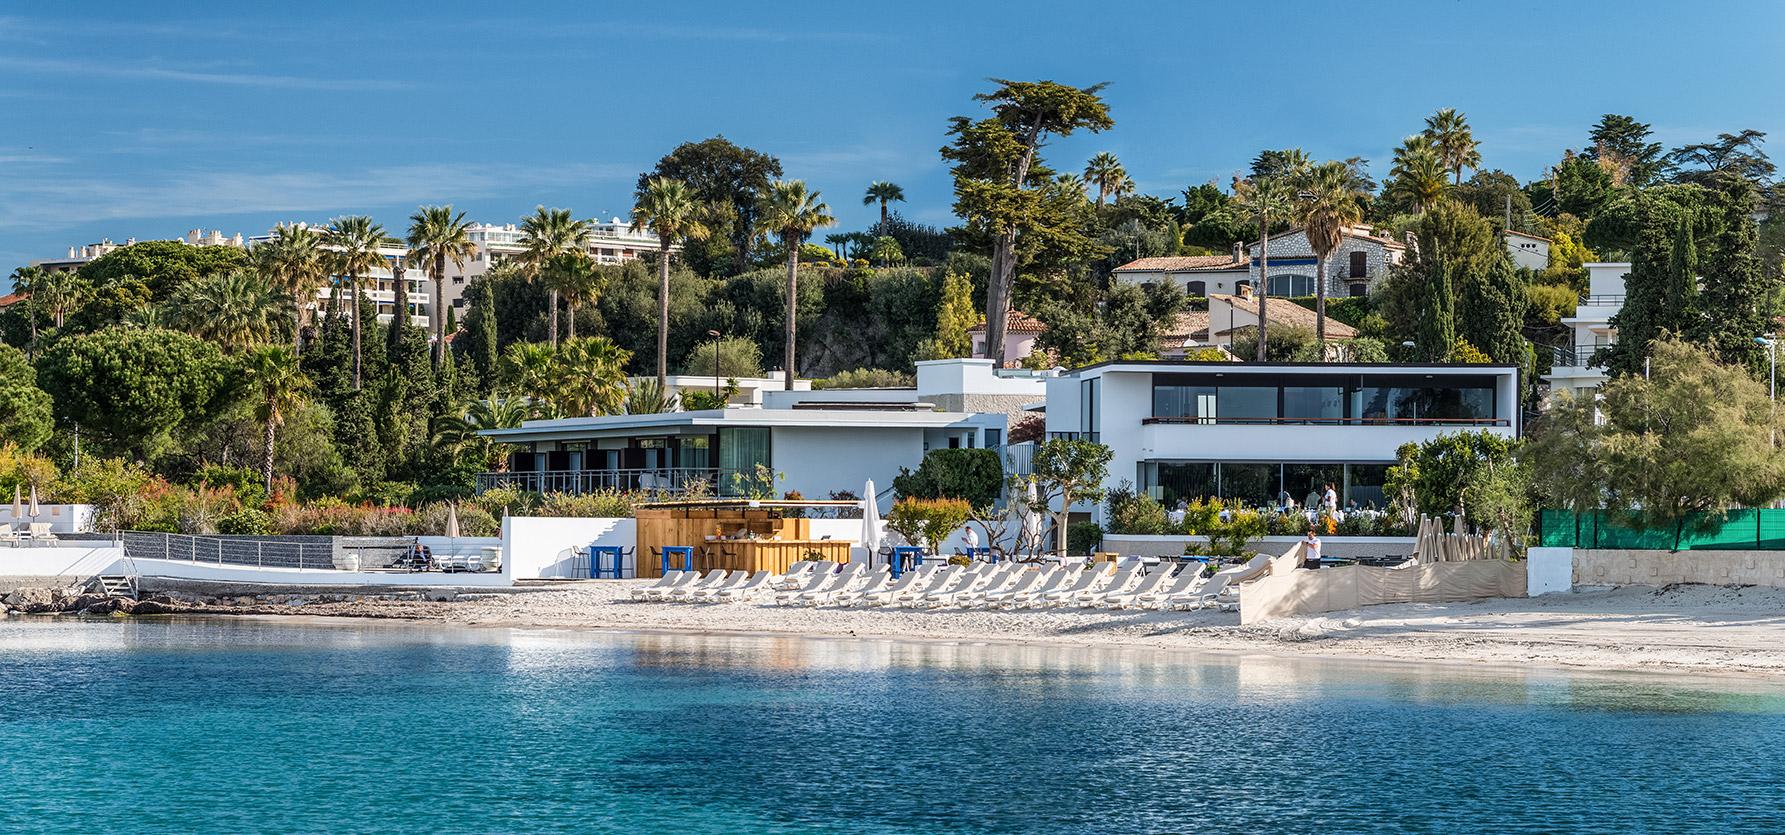 Cap D Antibes Beach Hotel French Riviera Luxury Thierry